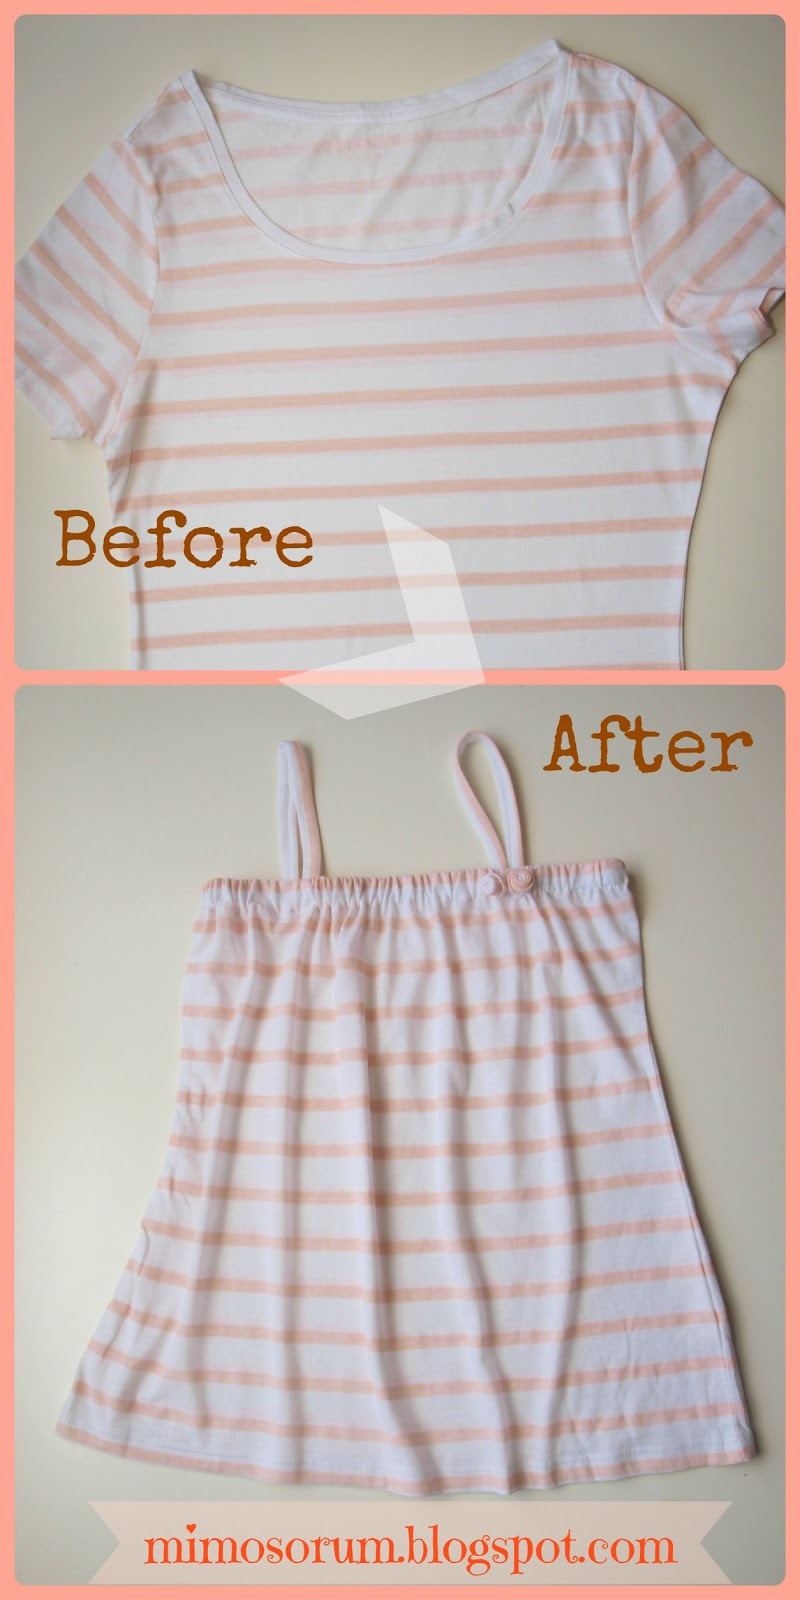 Mimosorum convertir una camiseta en un vestido make a for Make a dress shirt